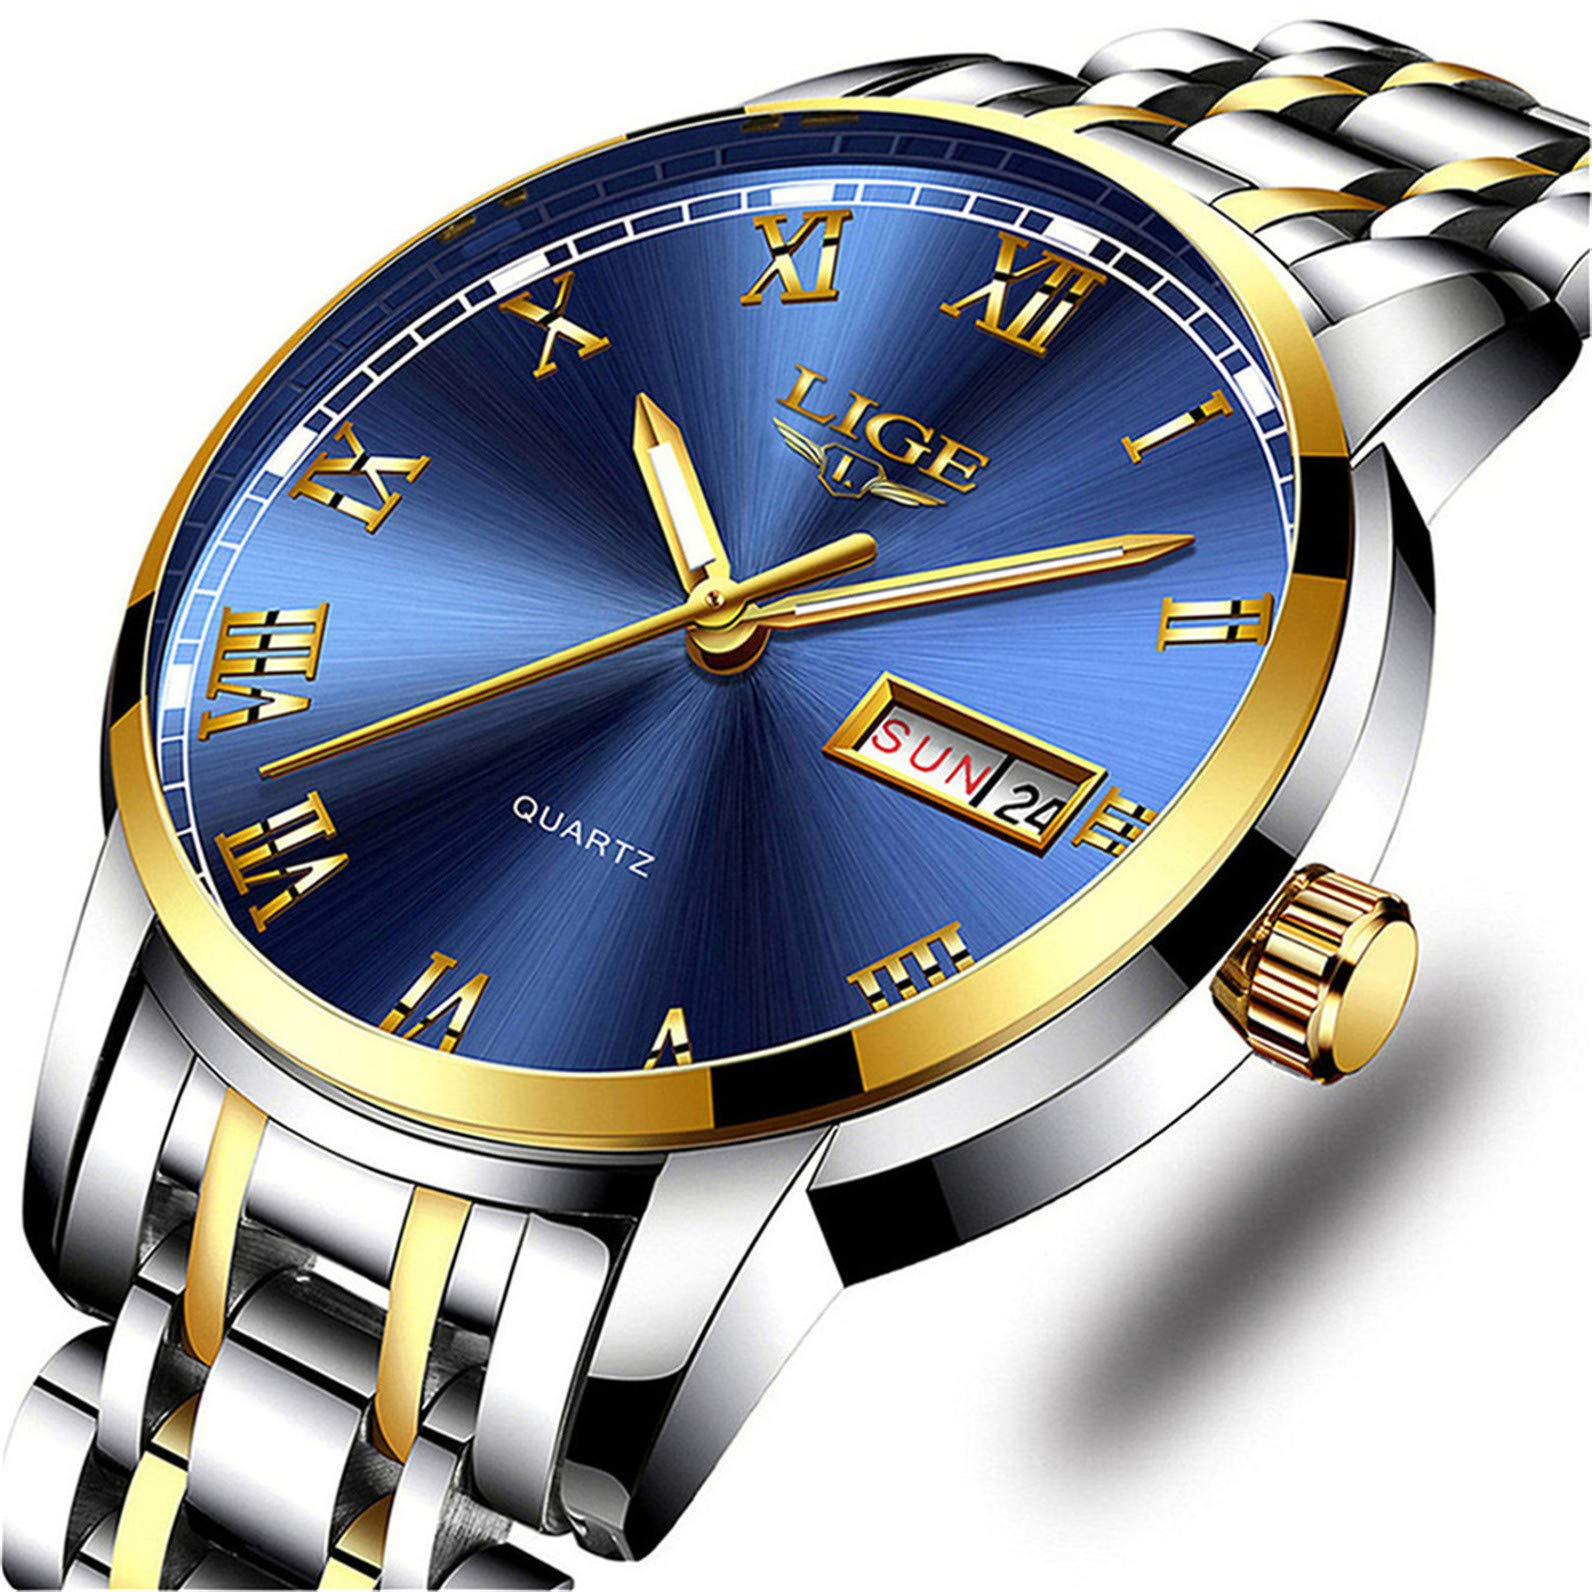 Mens Watches Stainless Steel Waterproof Analog Quartz Watch Men Simple Business Dress Wristwatch Blue Clock